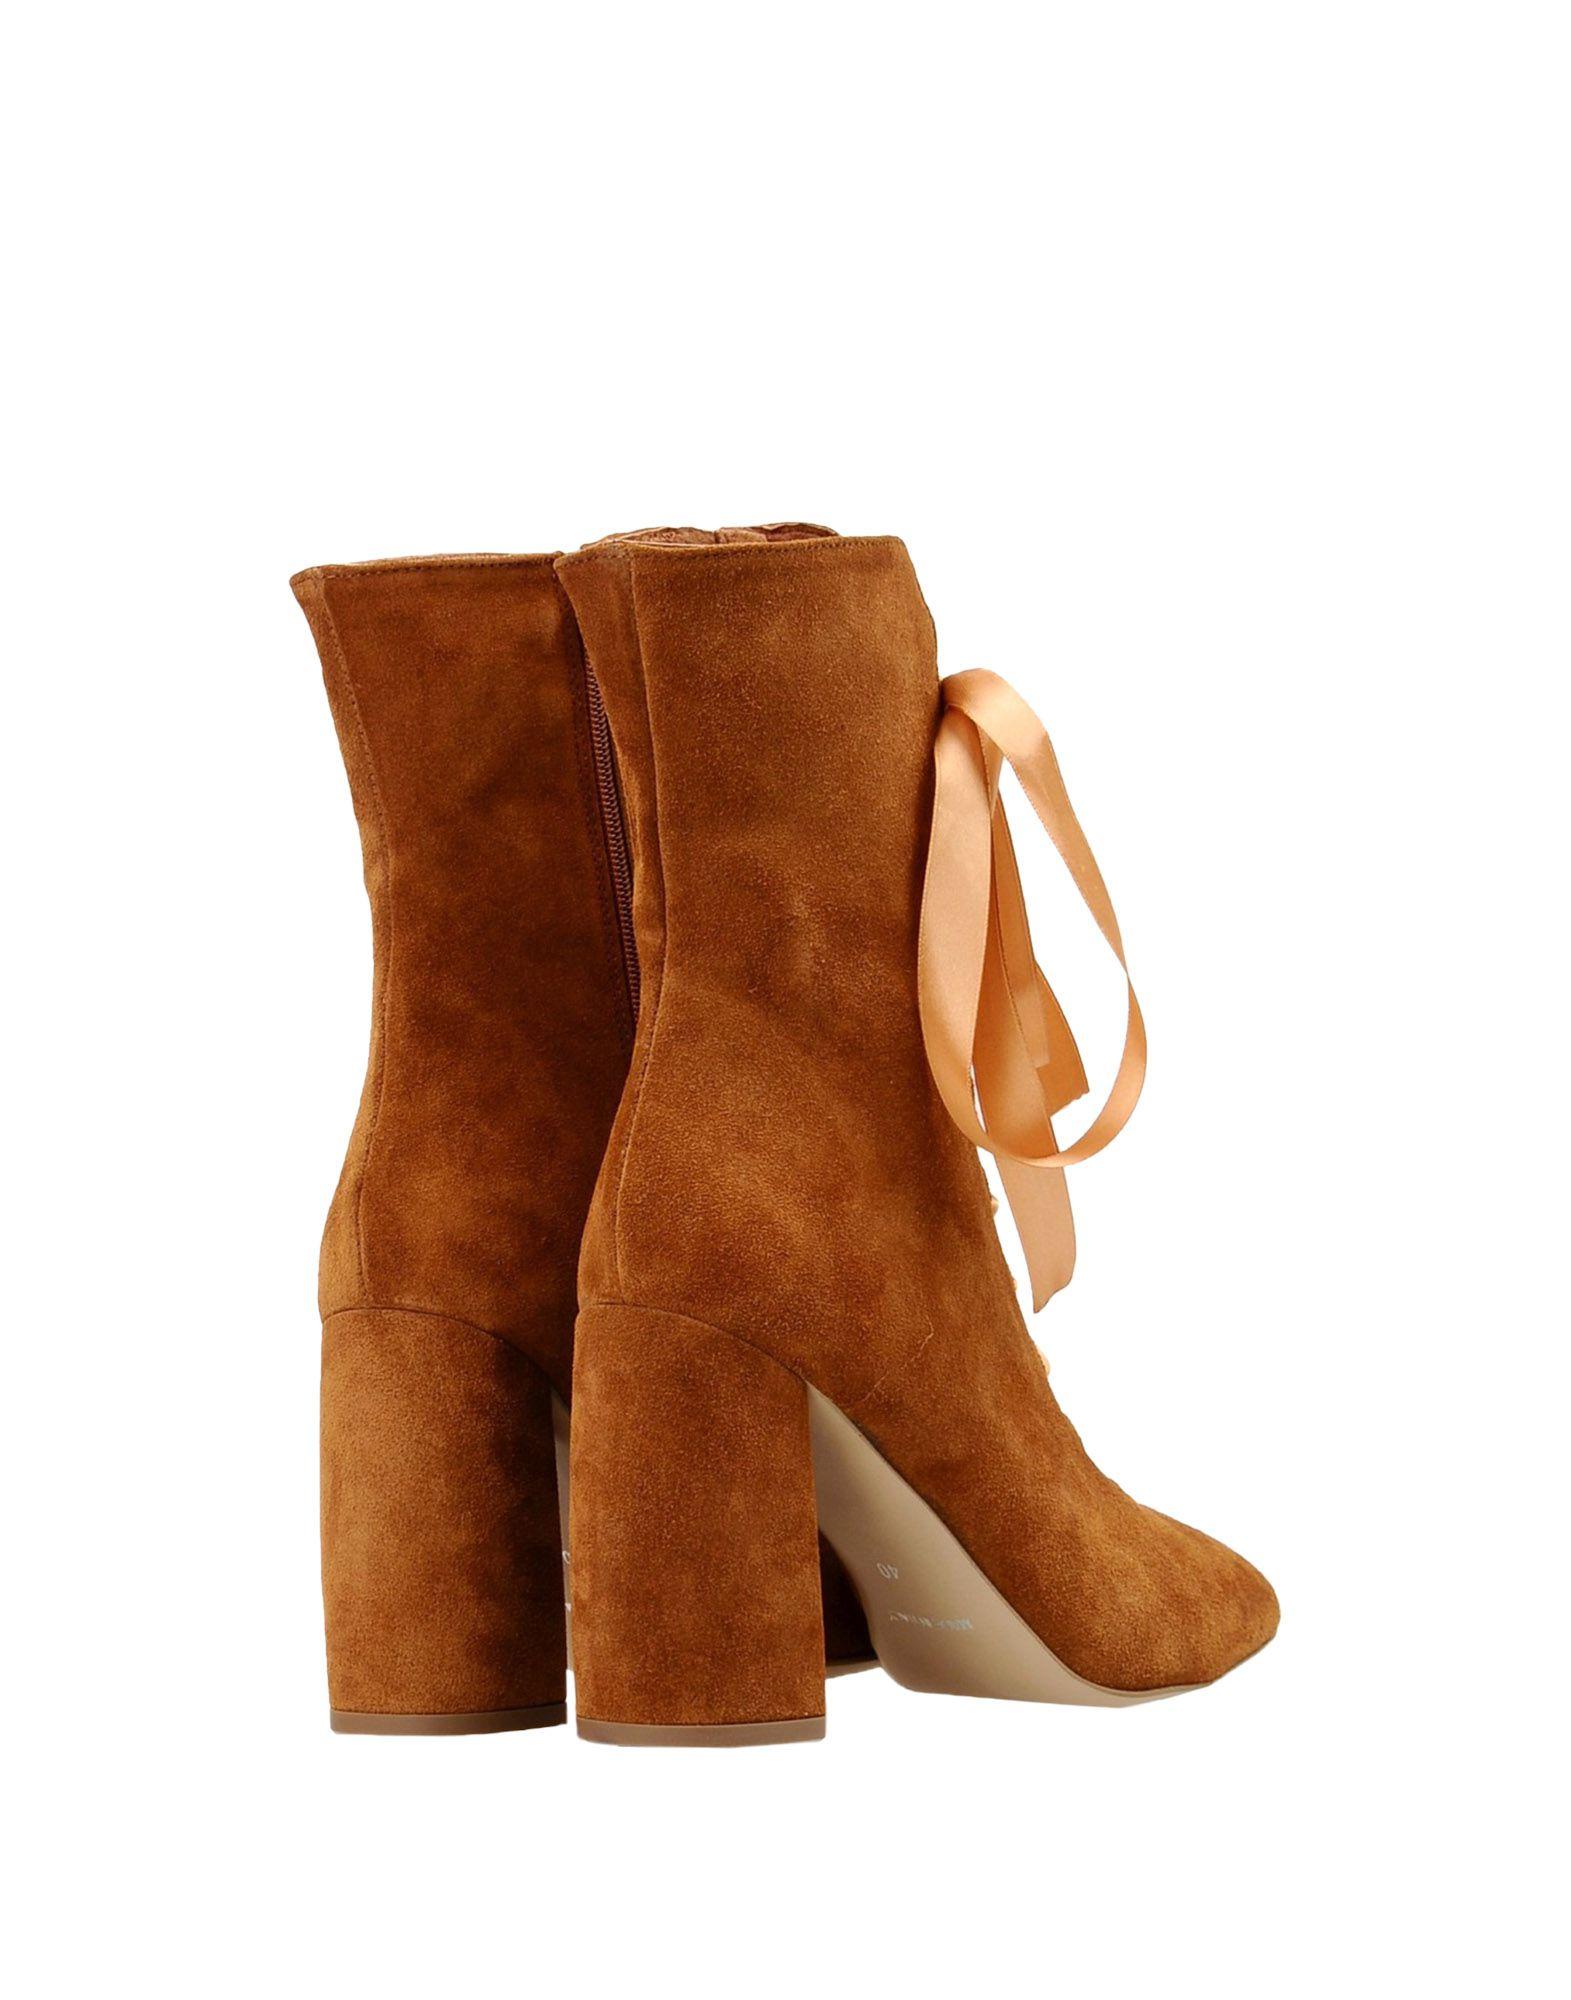 George J. 11427007VI Love Stiefelette Damen  11427007VI J. Gute Qualität beliebte Schuhe 62628b